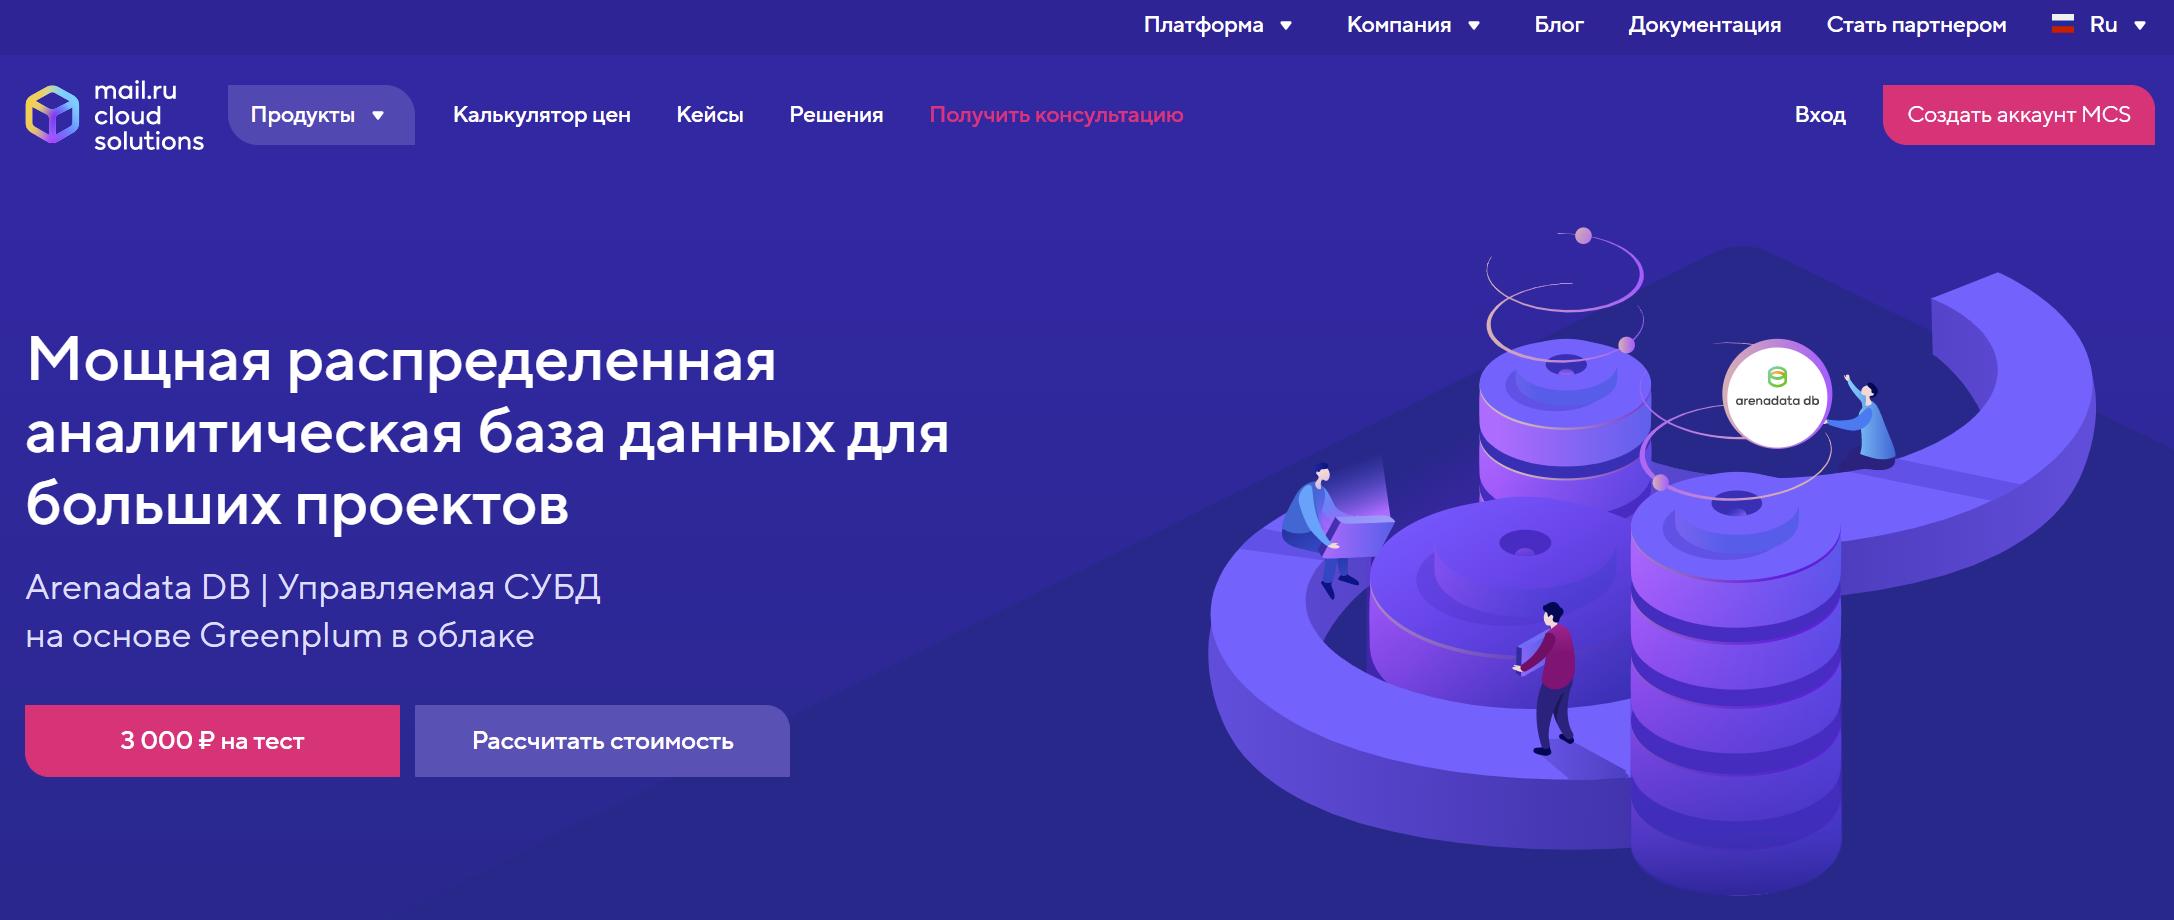 Облако Mail.ru Cloud Solutions дополнилось СУБД Arenadata DB Cloud версии Enterprise